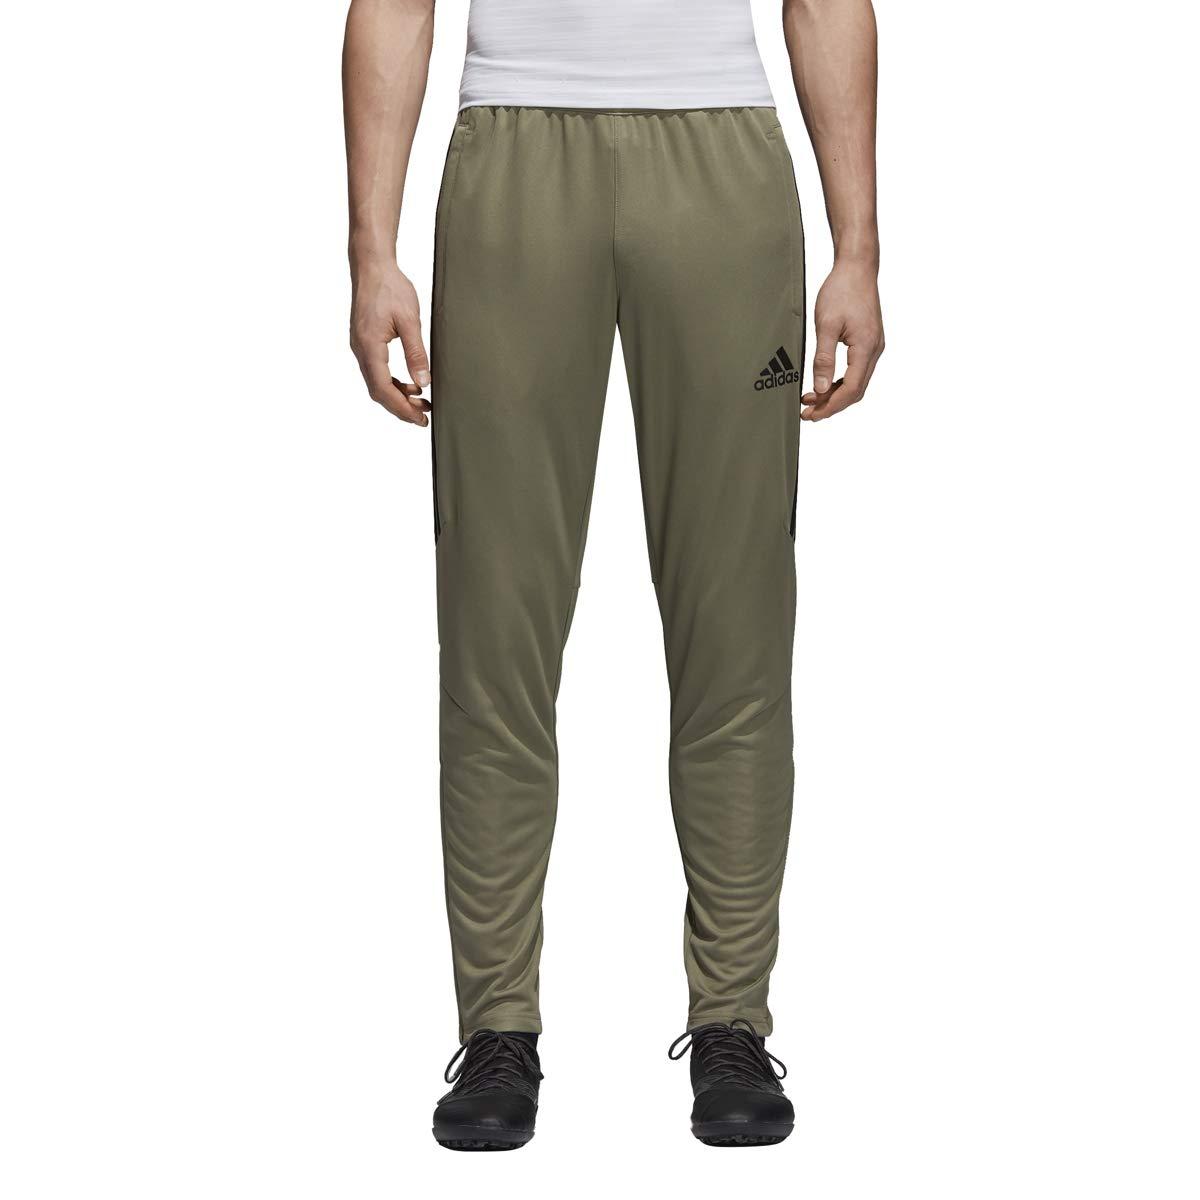 adidas Men's Tiro 17 Soccer Pants (M, Trace Cargo)